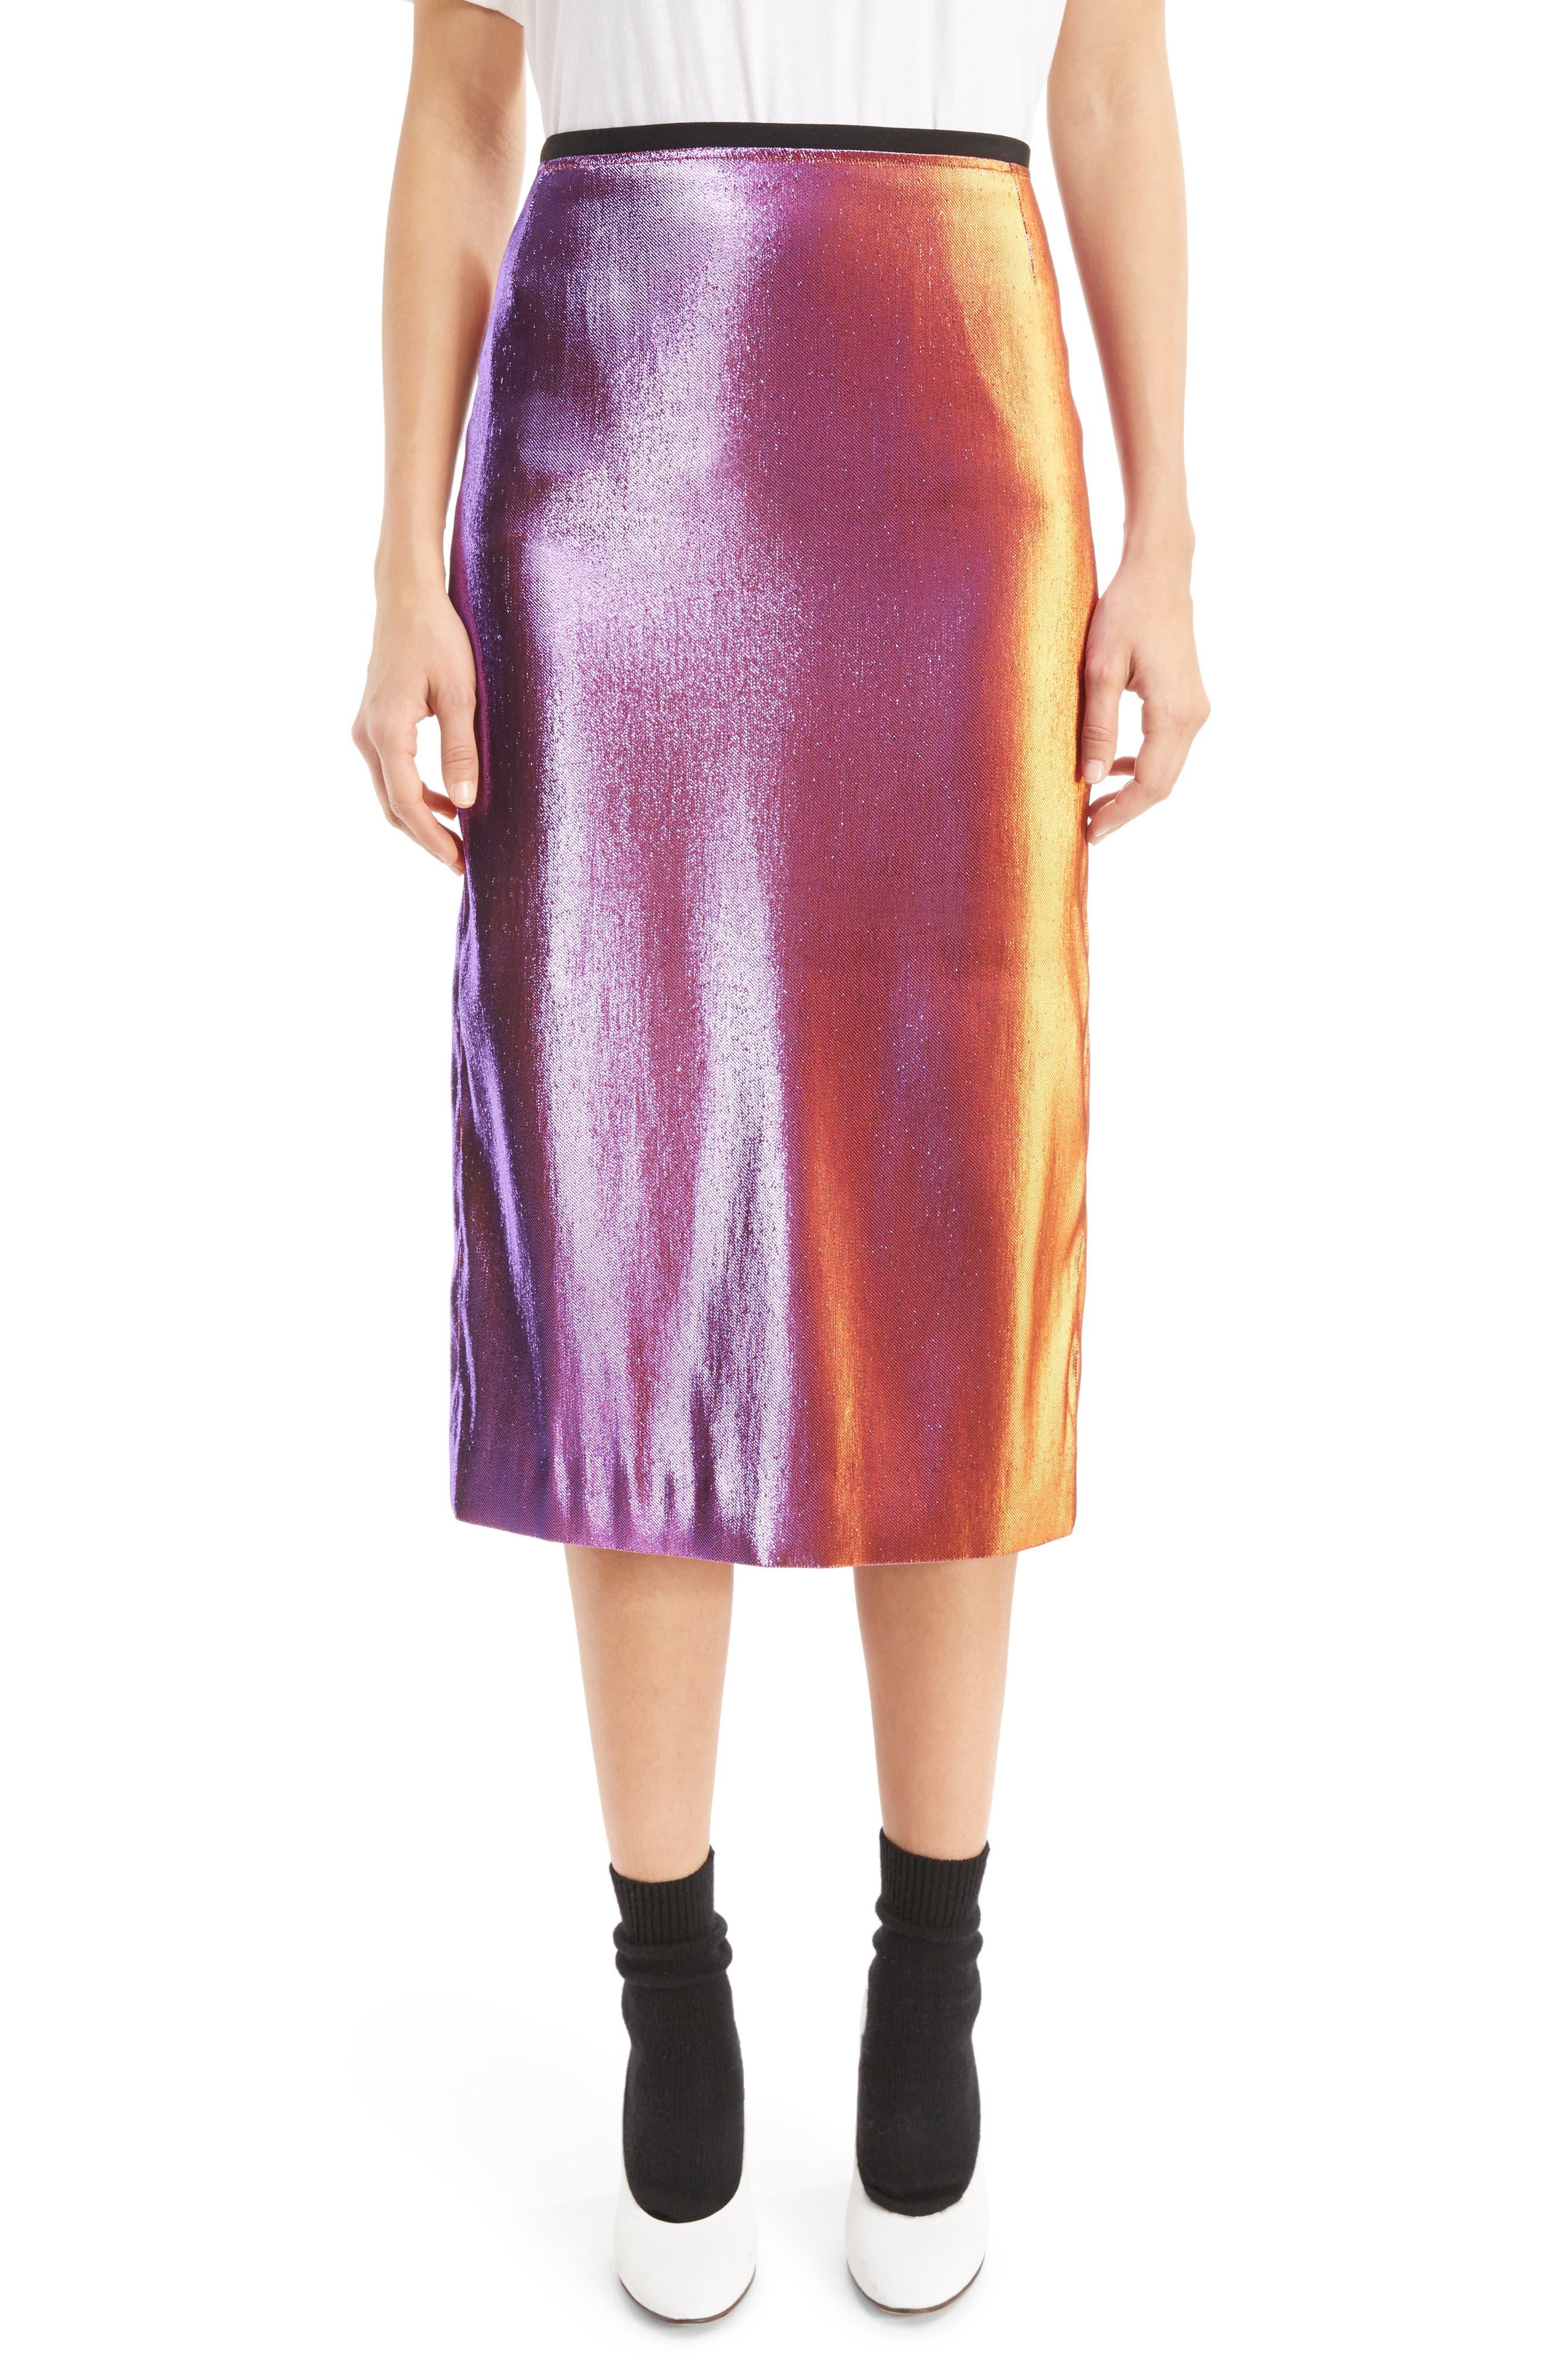 Dries Van Noten Two-Tone Lamé Pencil Skirt